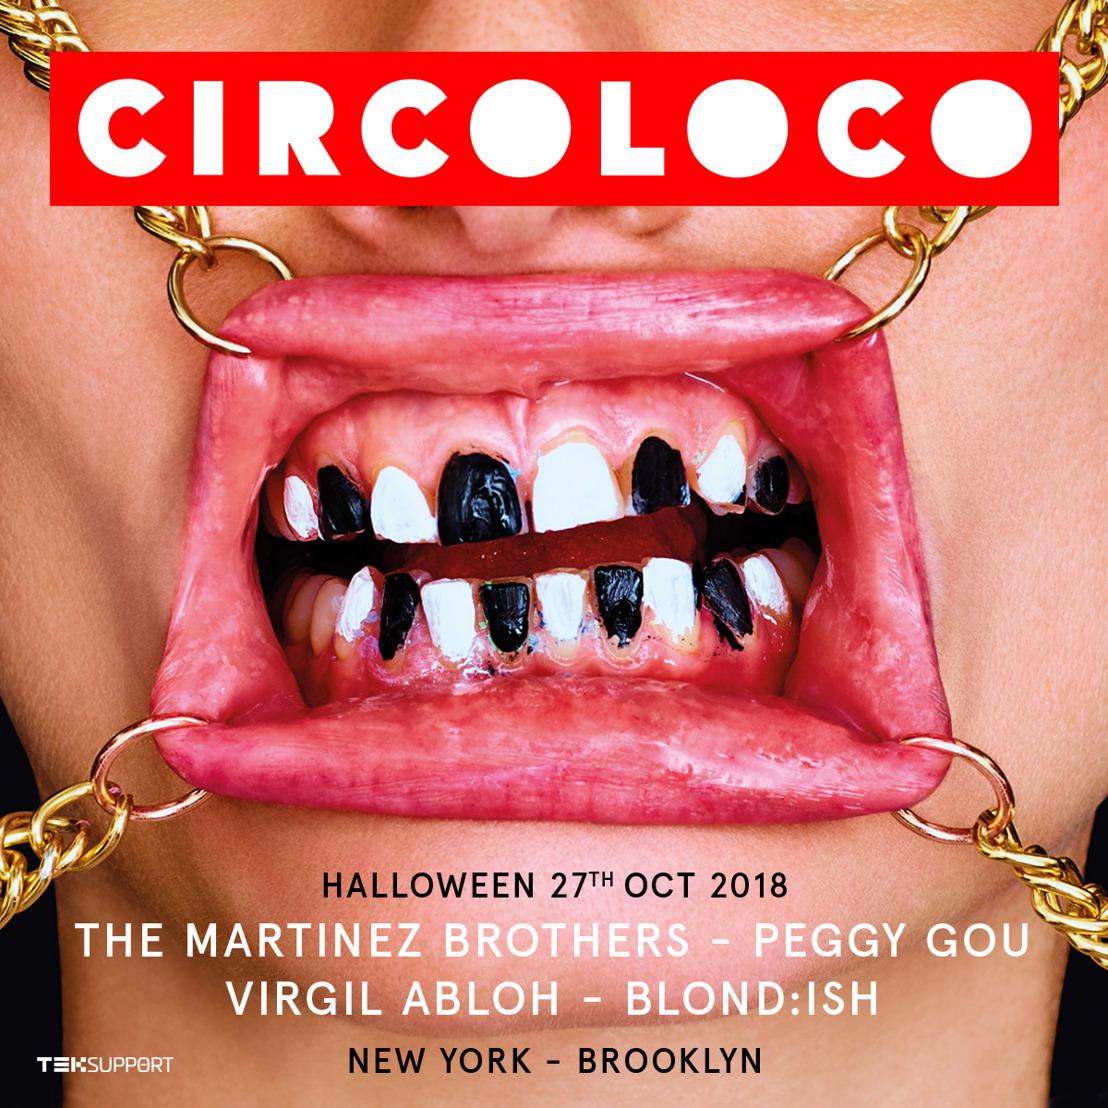 circoloco halloween 2018 announced | edm maniac